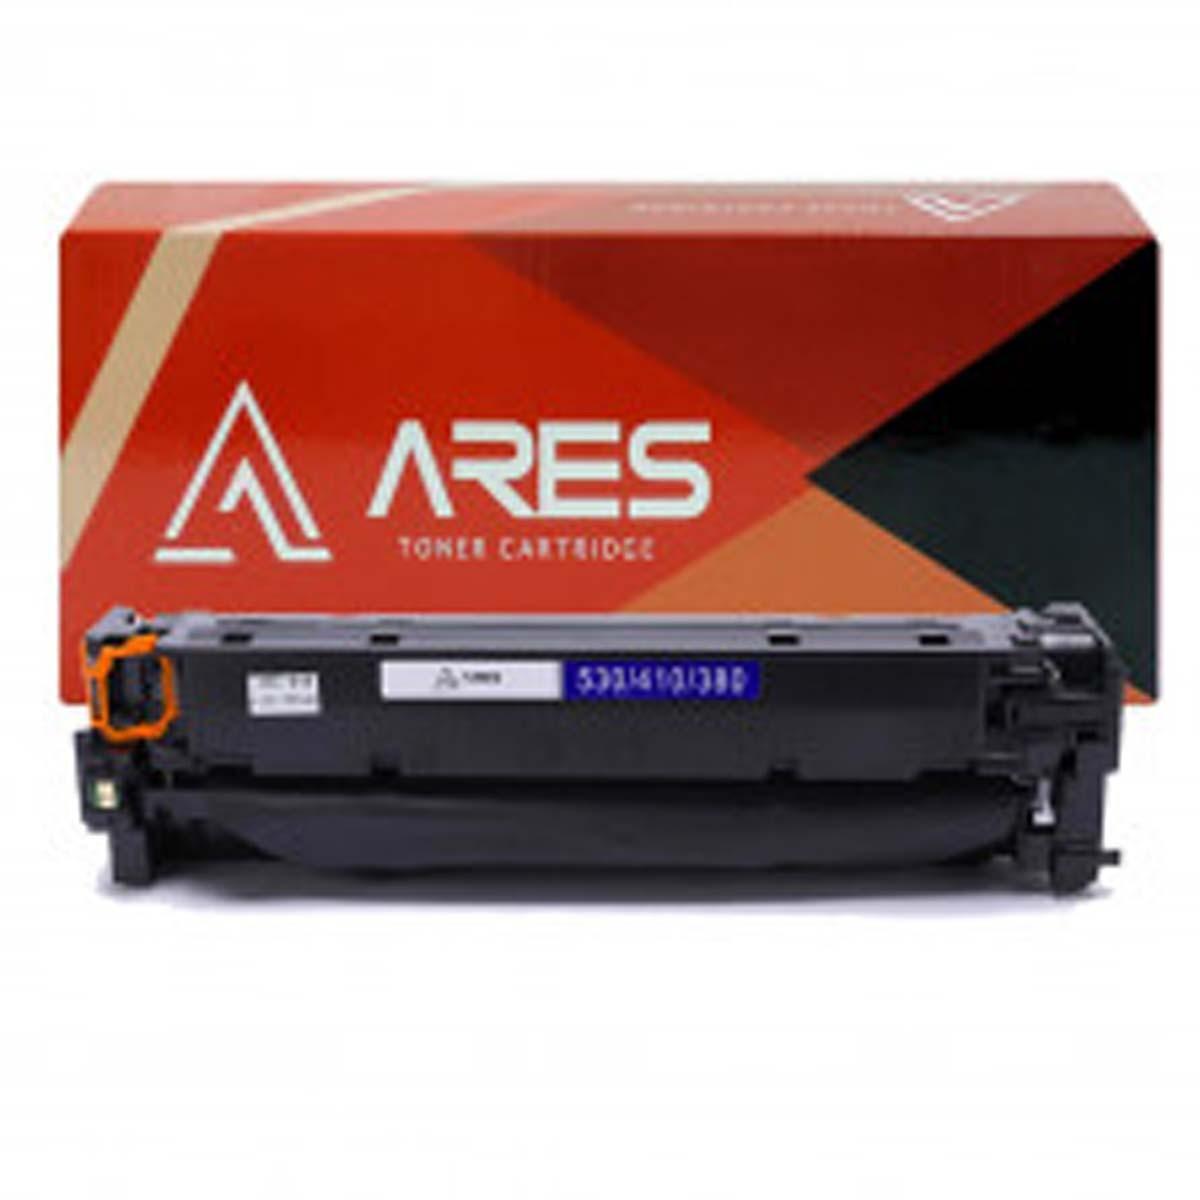 Toner Compativel com HP CC530A 530 304A - Preto - CP2025 CP2025DN CM2320 CM2320NF CM2320MFP - 3,5K